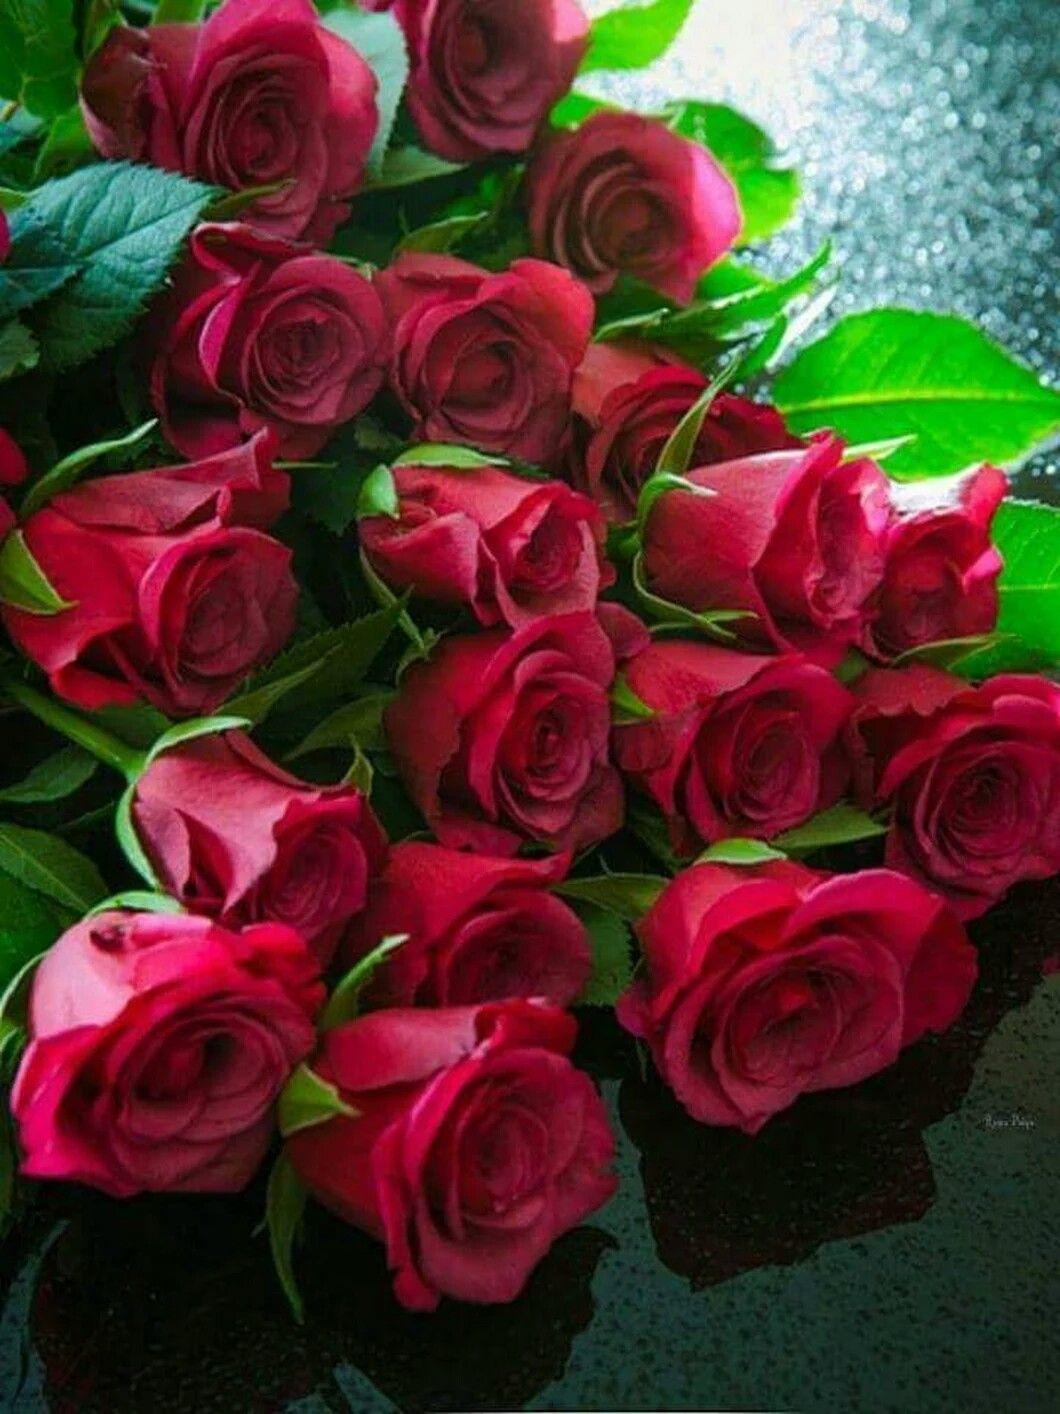 Pin De Marilyn Deffenbaugh En Flores Hermosas Flores Bonitas Flores Exoticas Rosas Bonitas